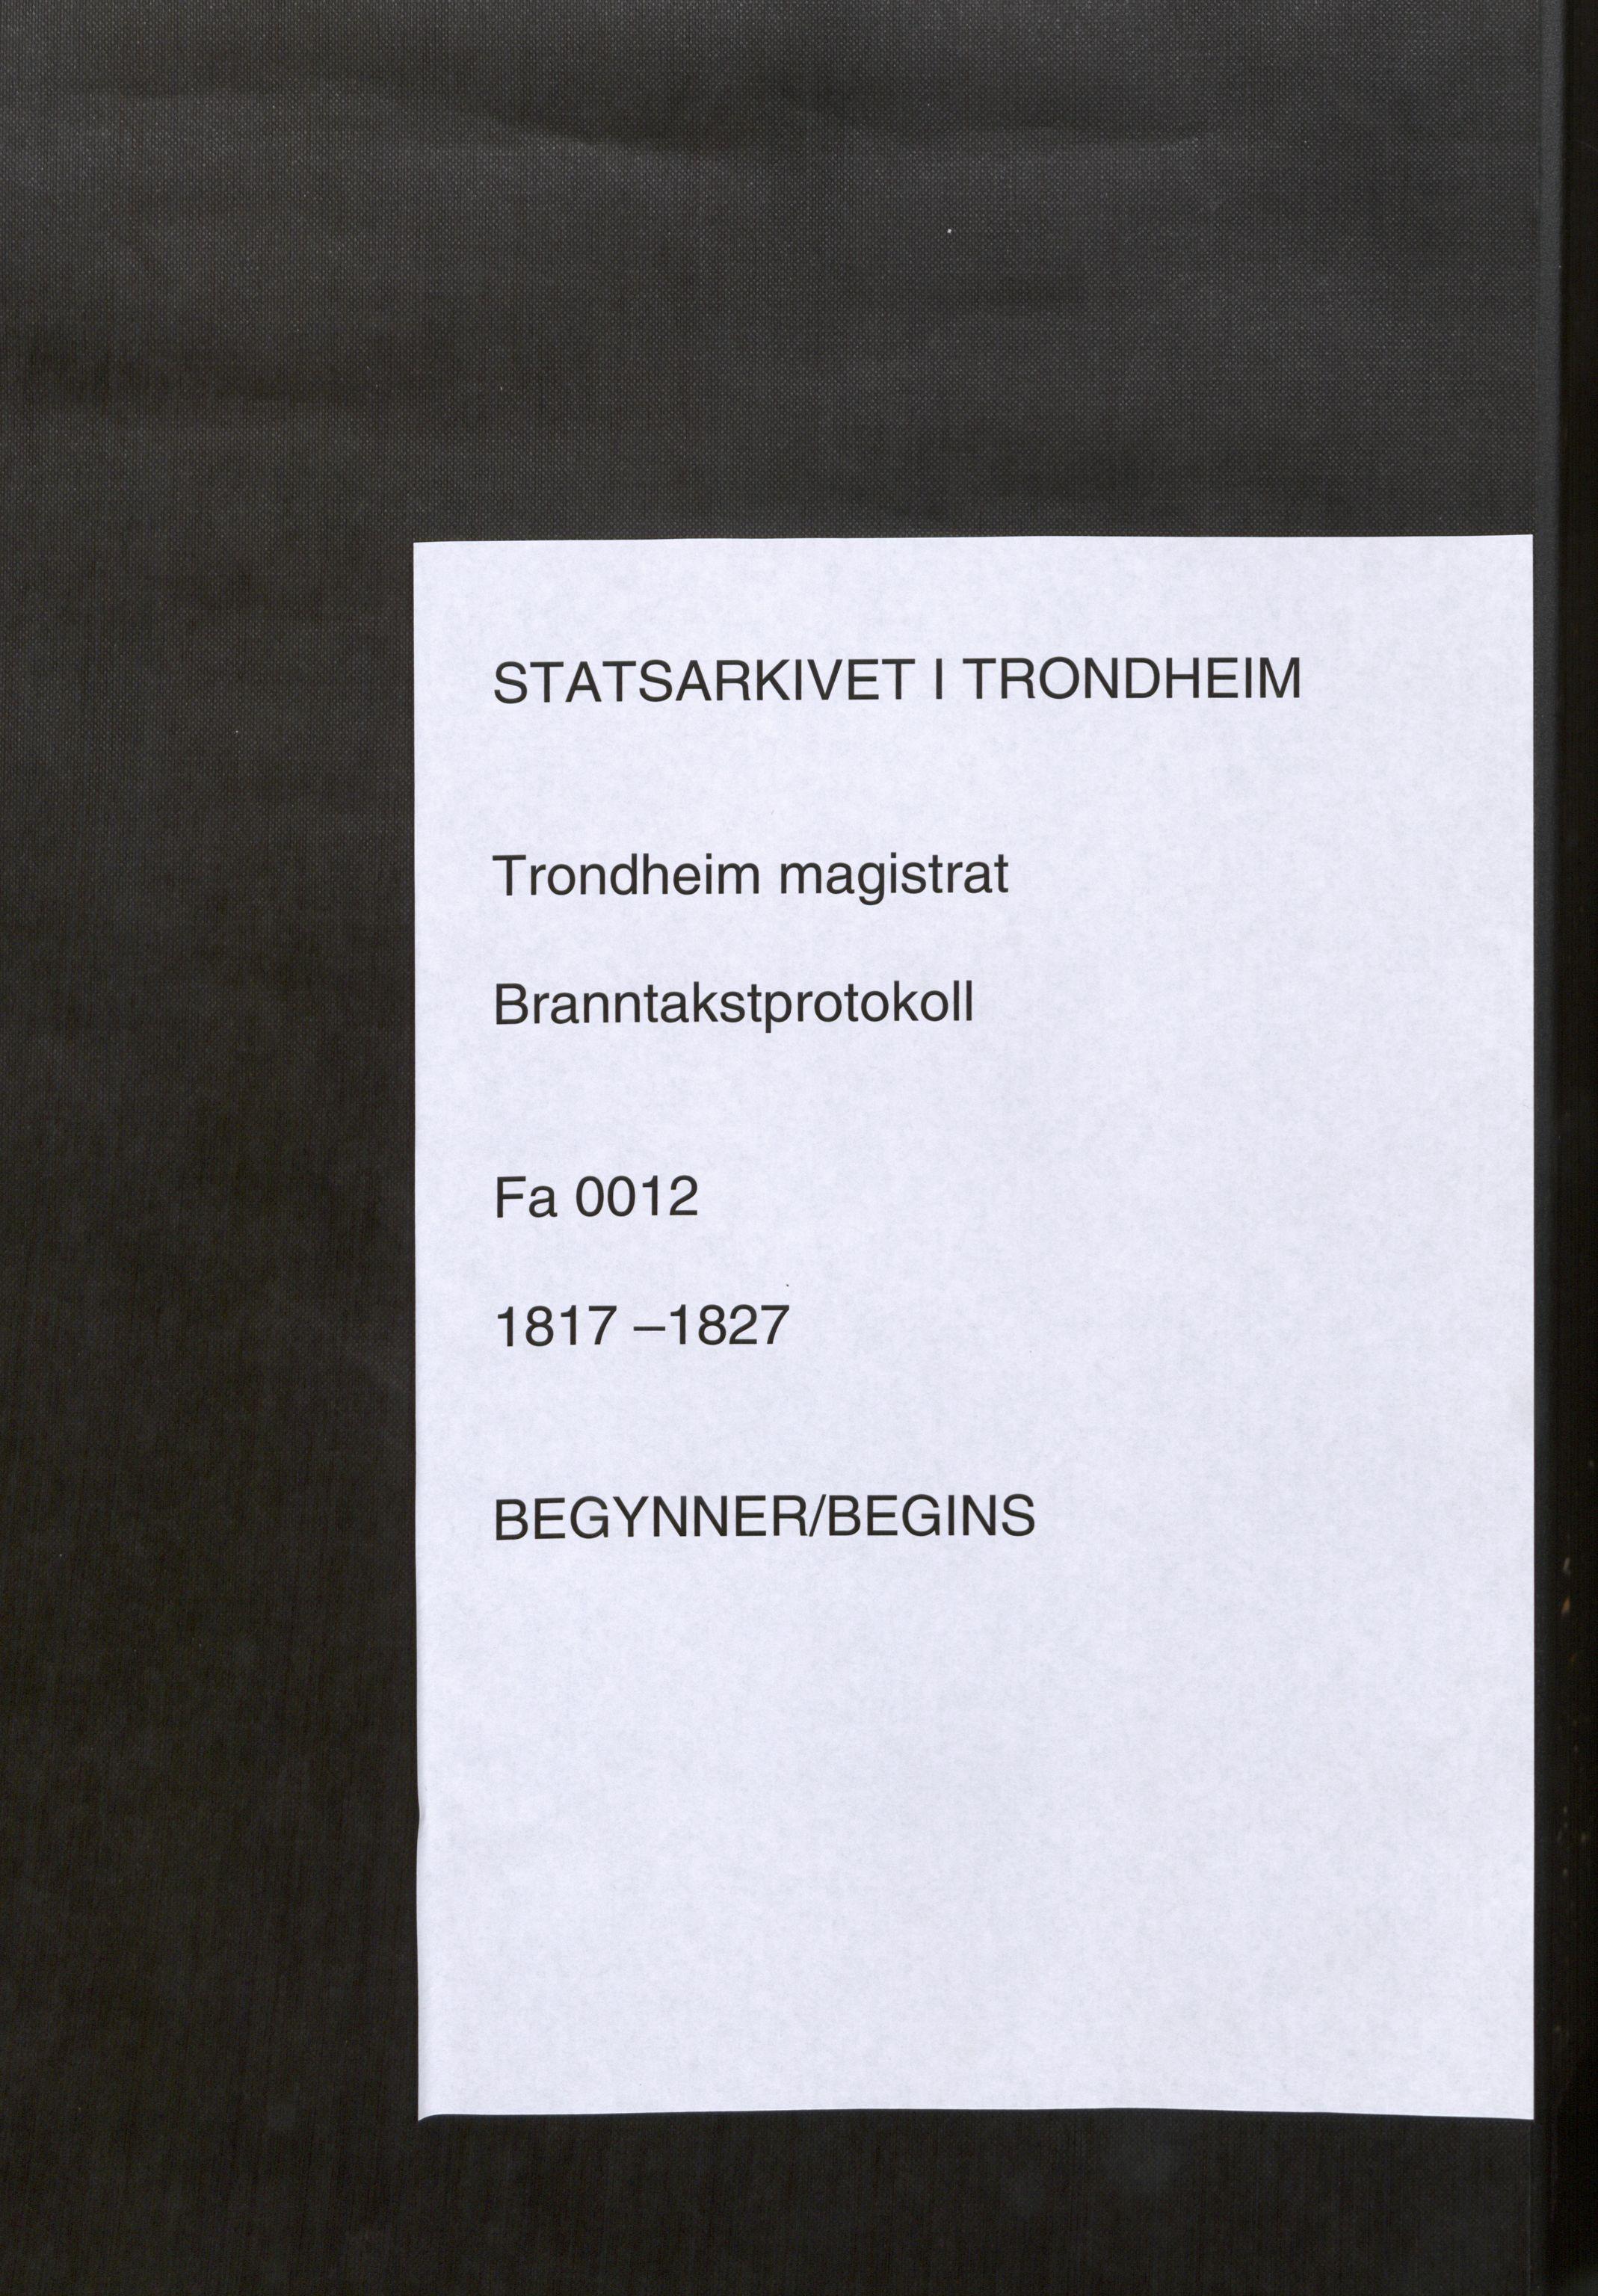 SAT, Norges Brannkasse Trondheim magistrat, Fa/L0017: Branntakstprotokoll K19, 1817-1827